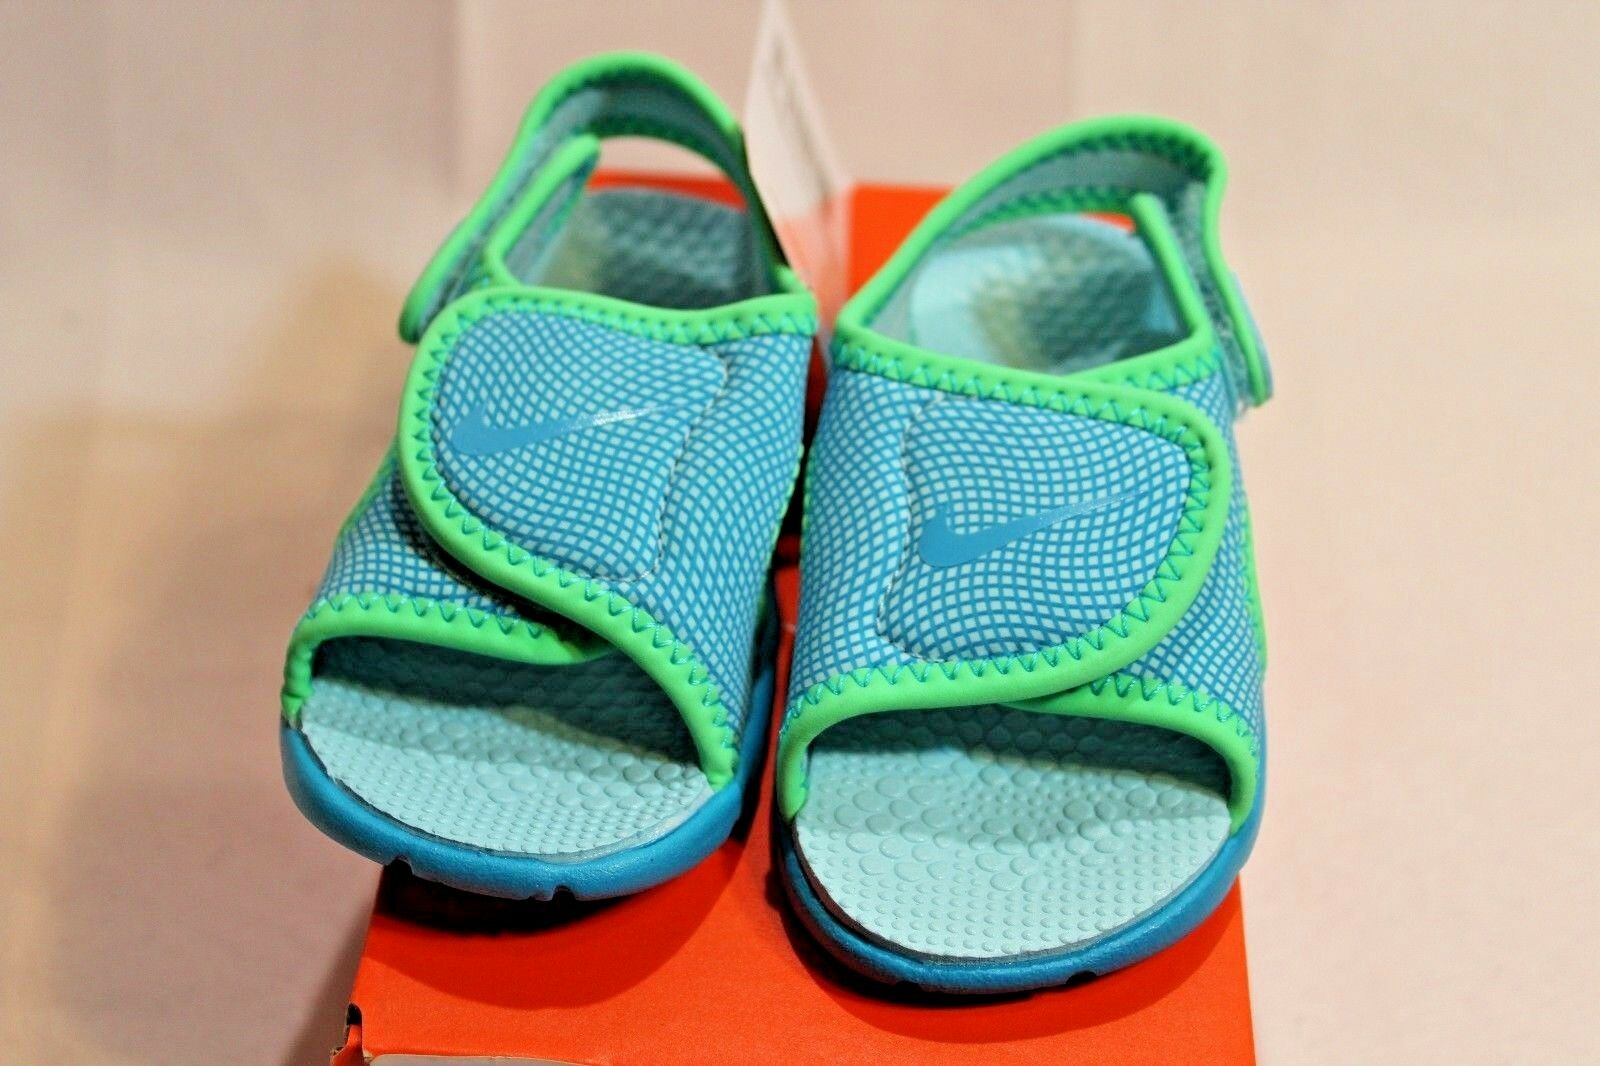 New Infant/Toddler Blue/green Nike Sunray Adjust 4 athletic sandals/shoes